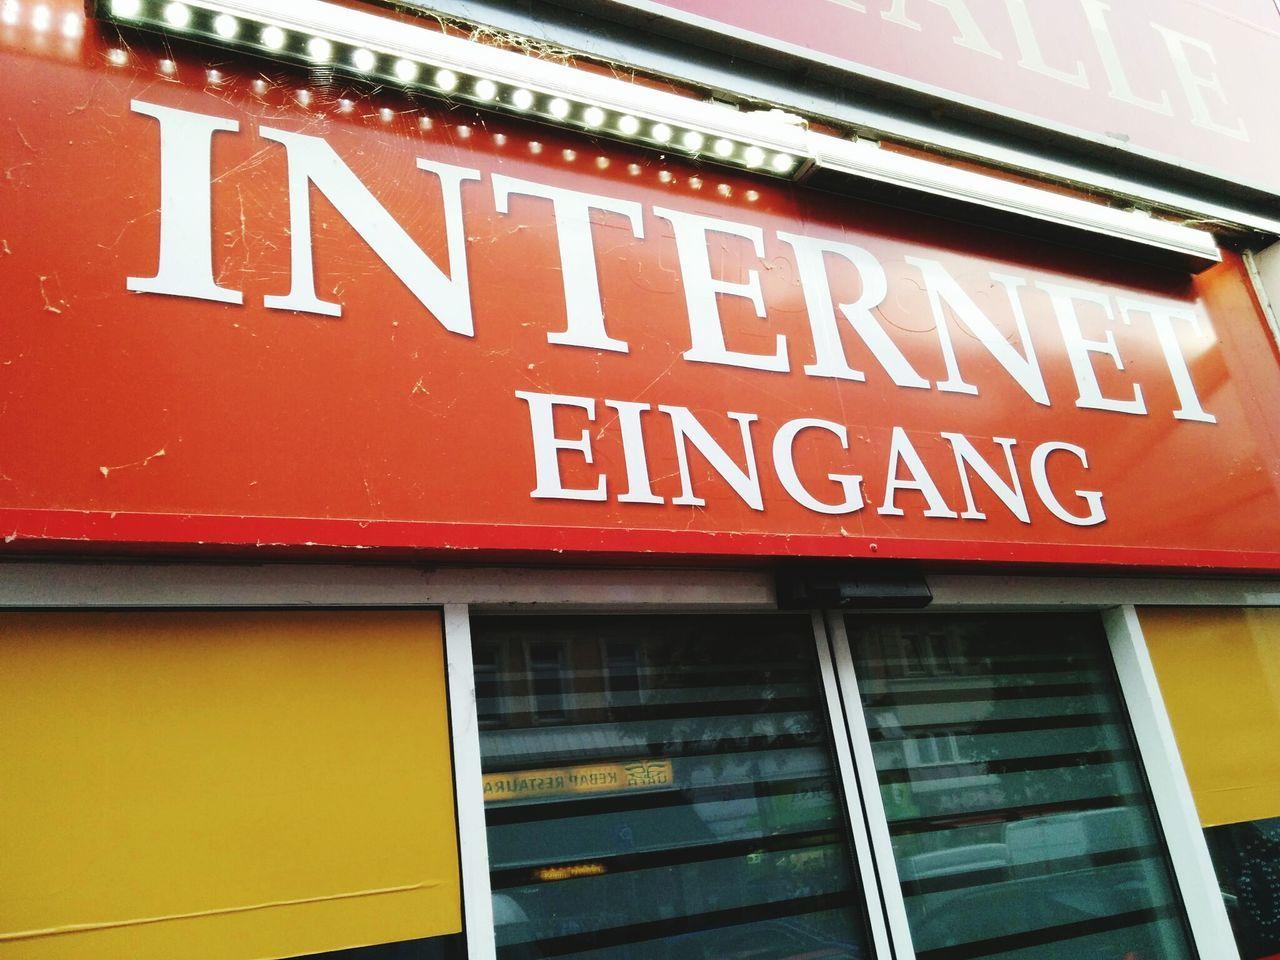 Wo alles begann. Internet Web Eingang Eingangsbereich Entrance Internetcafé